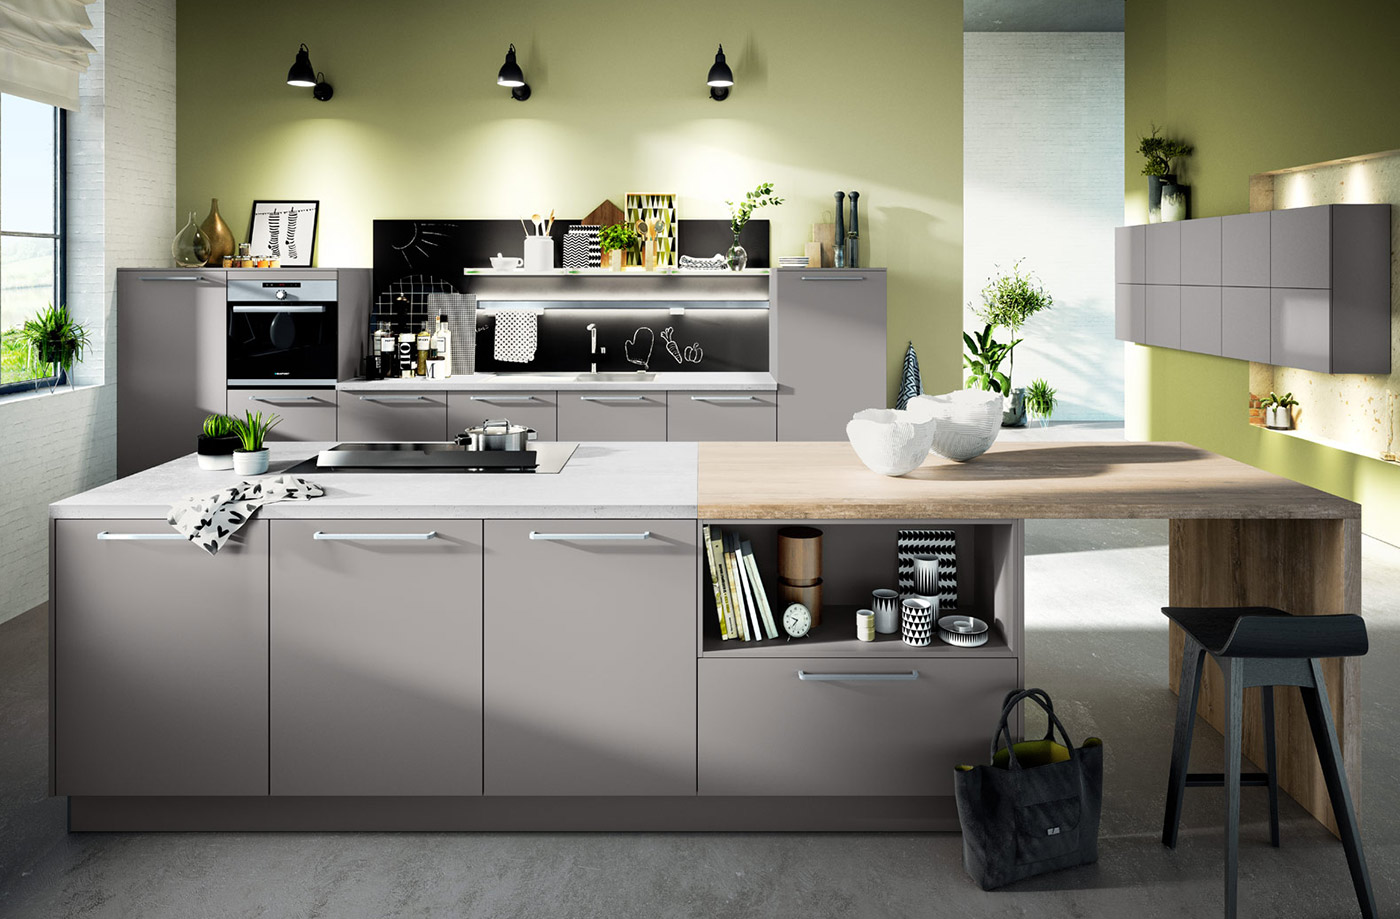 k chen lippold senke gmbh dreieich k chen. Black Bedroom Furniture Sets. Home Design Ideas